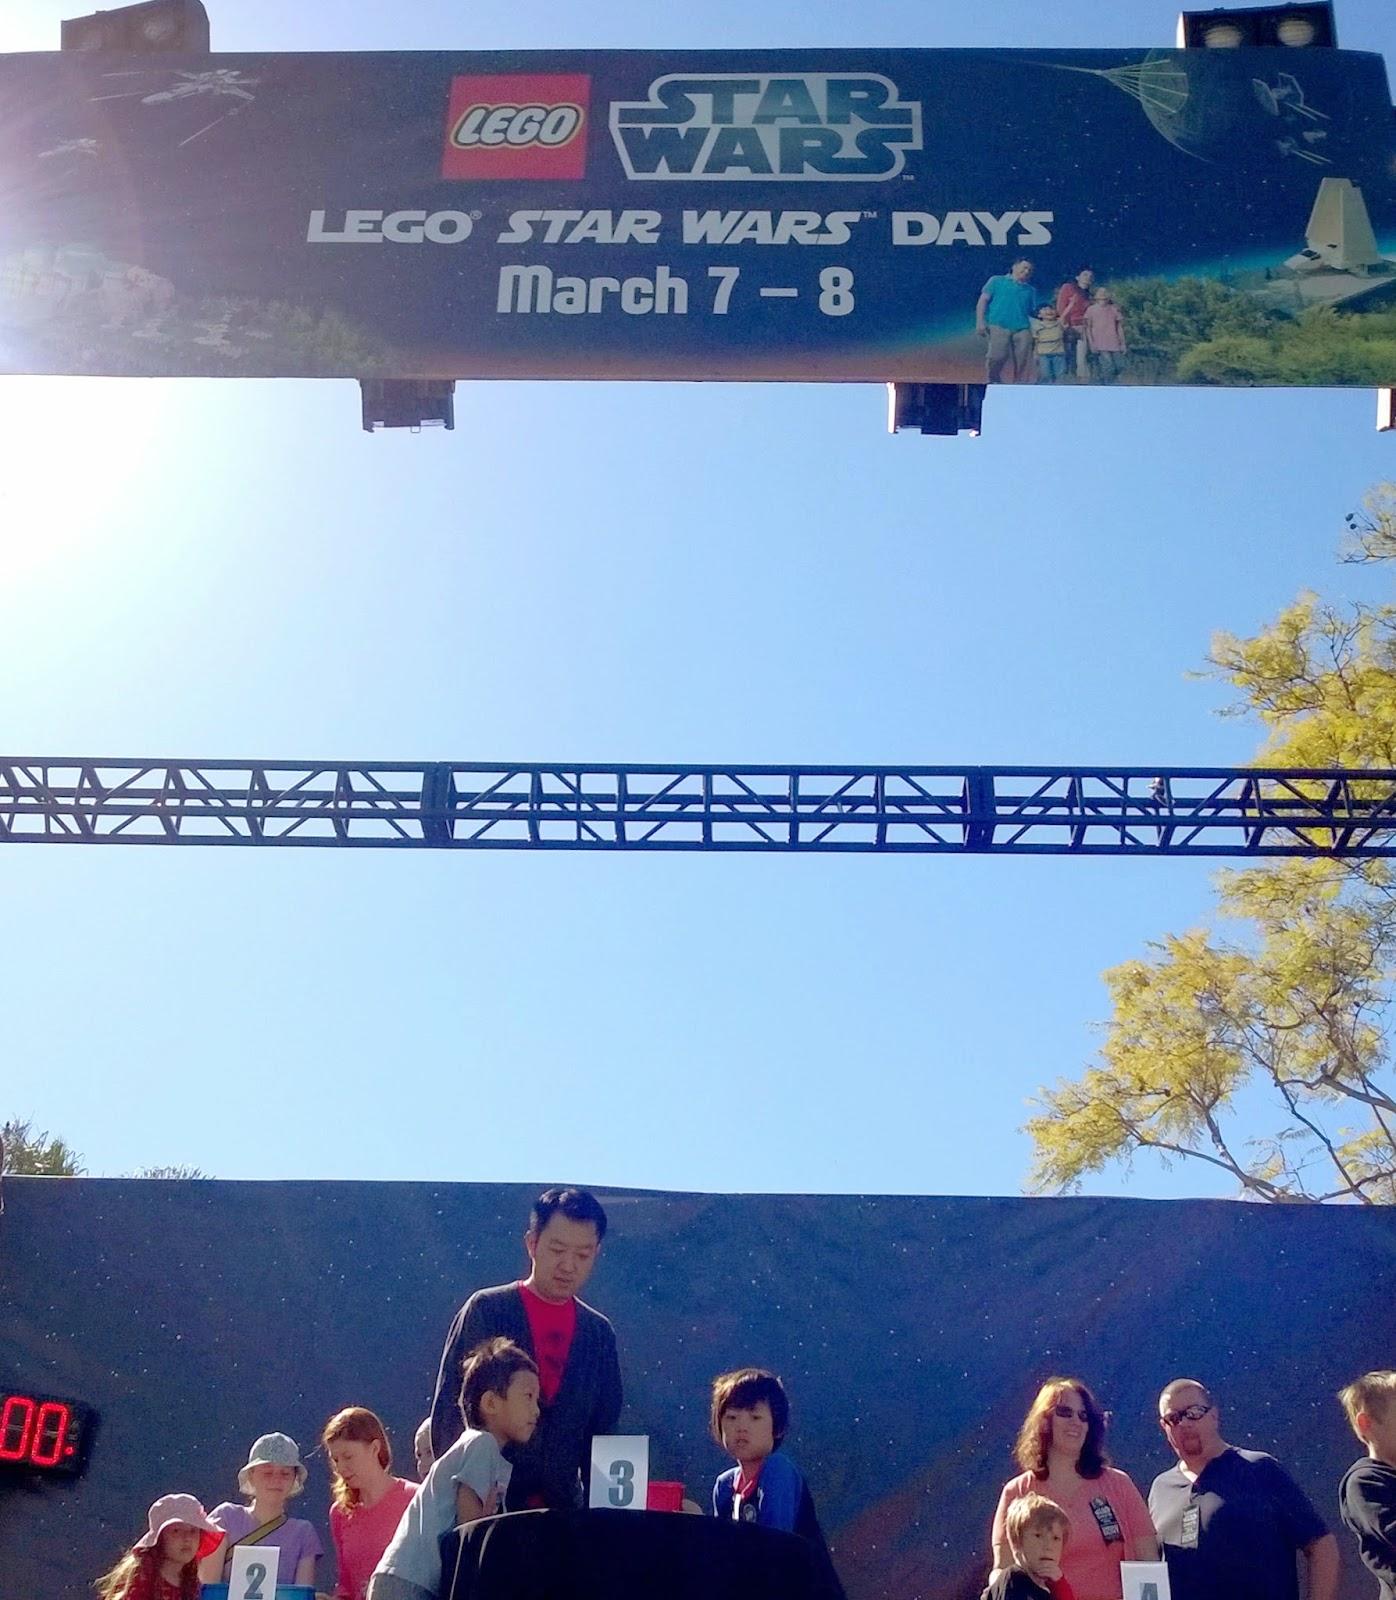 Legoland California Star Wars Days family build challenge